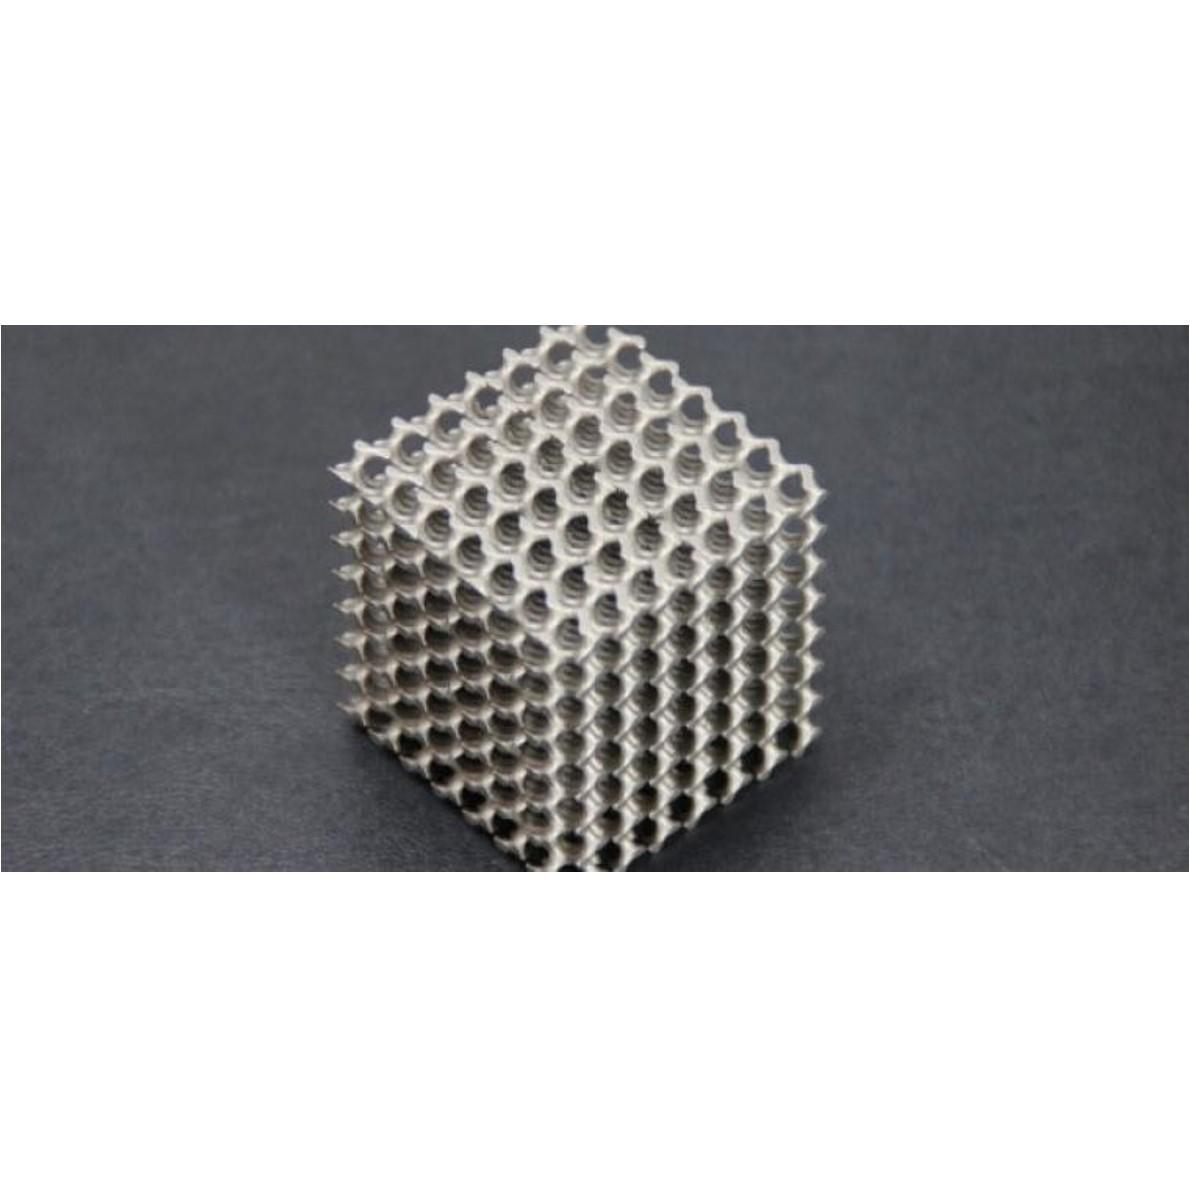 3d-systems-prox-200-geometric-metal-part-banner.jpg